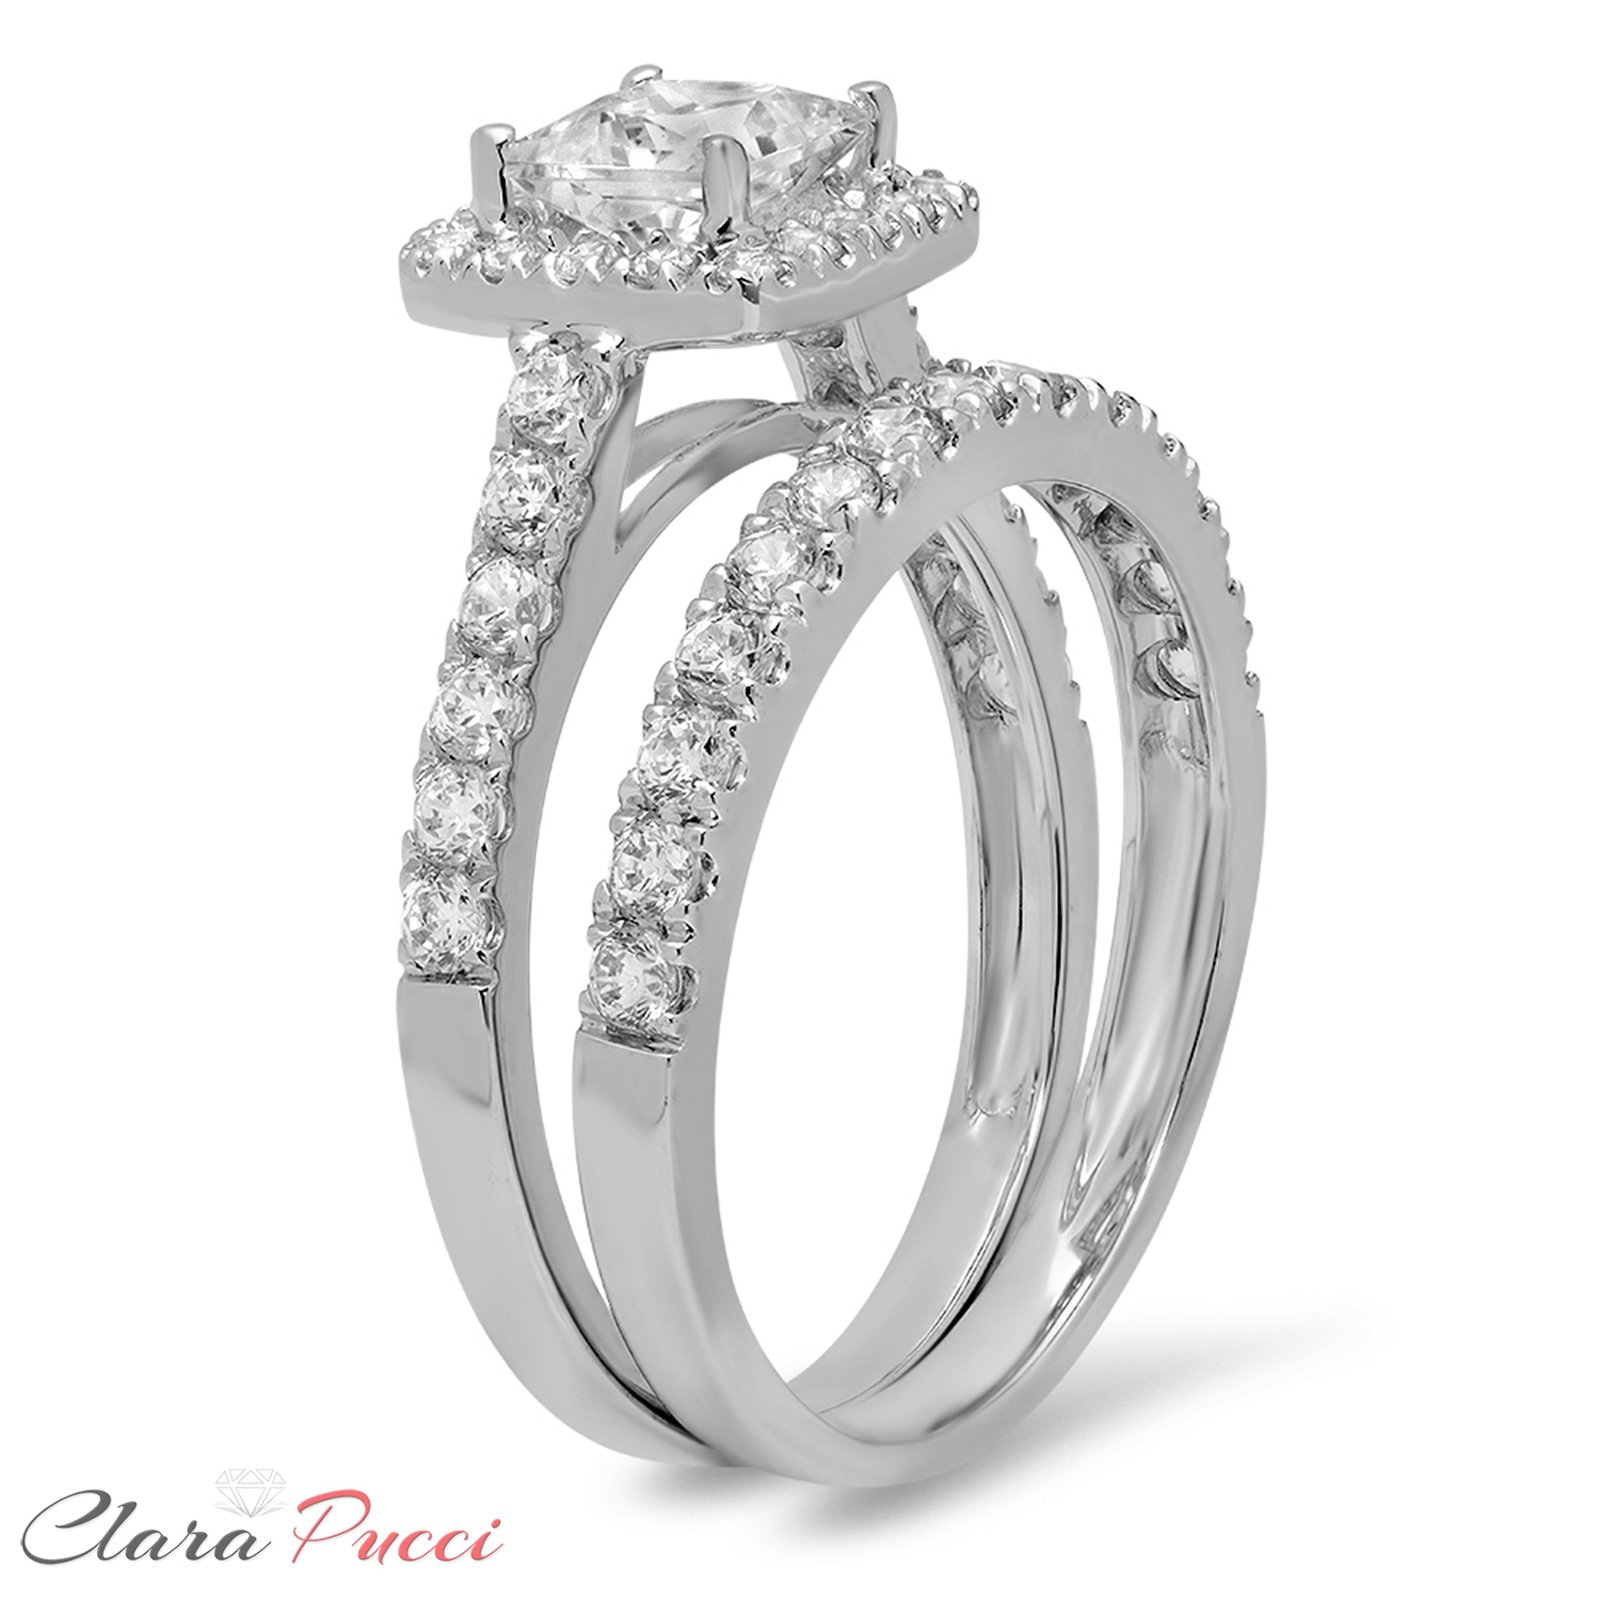 Clara Pucci 1.60 CT Princess Cut CZ Pave Halo Bridal Engagement Wedding Ring Band Set 14k White Gold, Size 8.5 by Clara Pucci (Image #2)